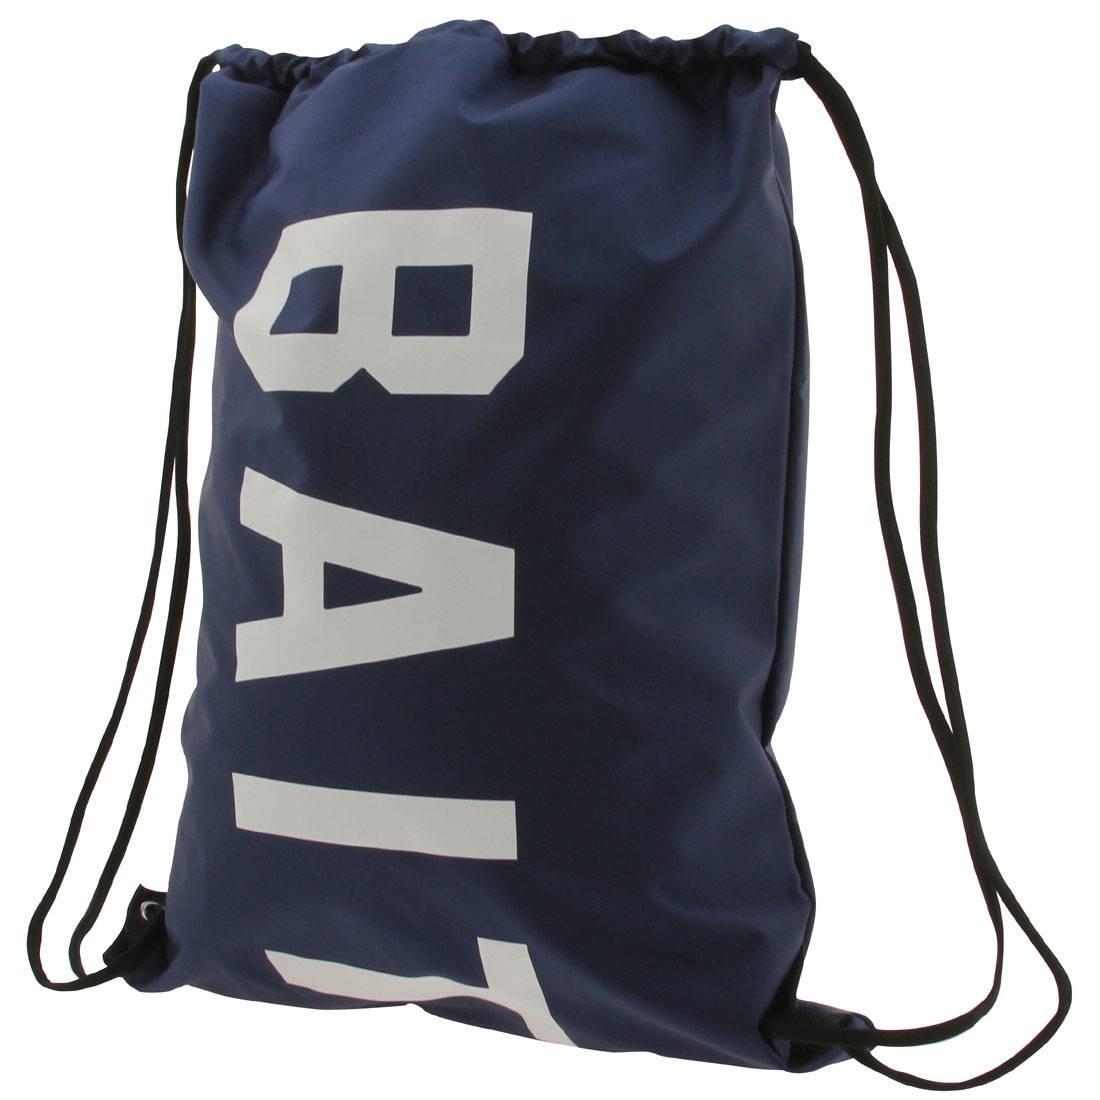 BAIT Logo Nylon Sachet Bag (navy)